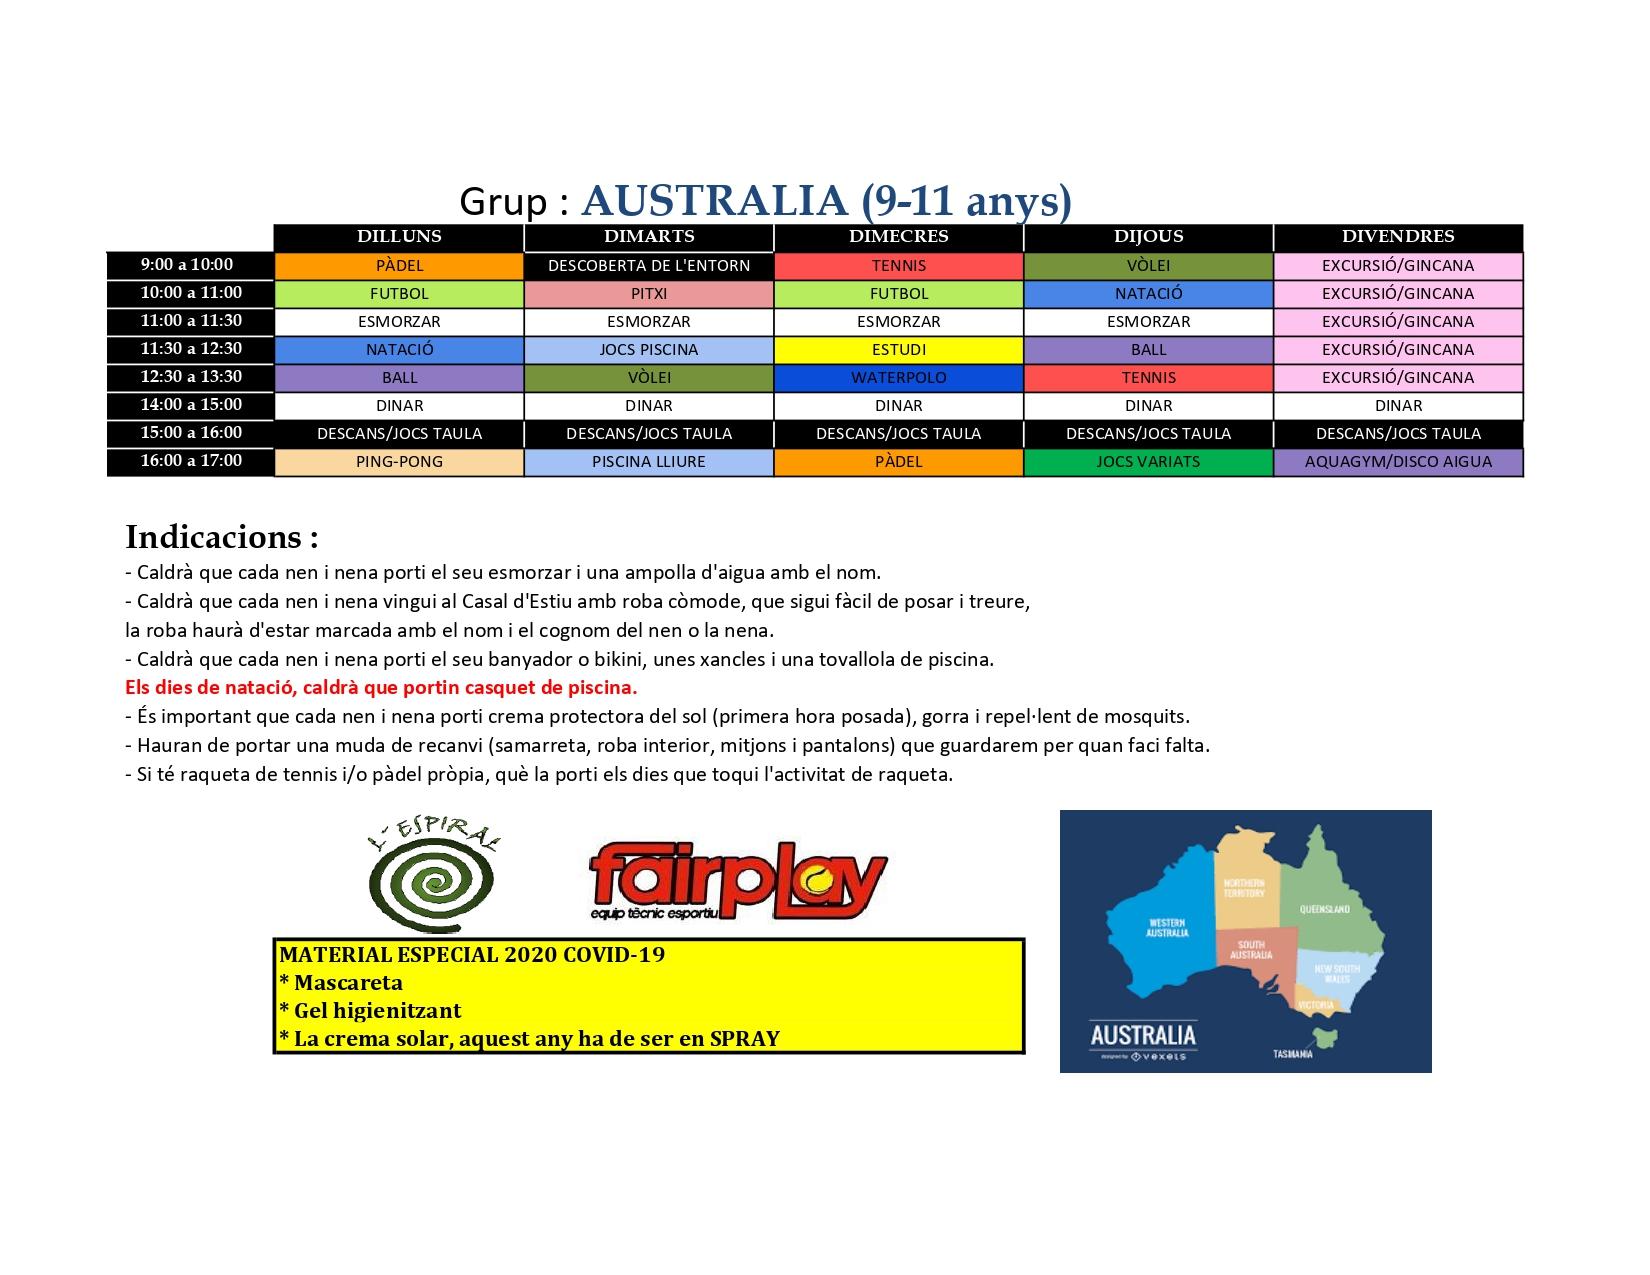 GRUP AUSTRALIA